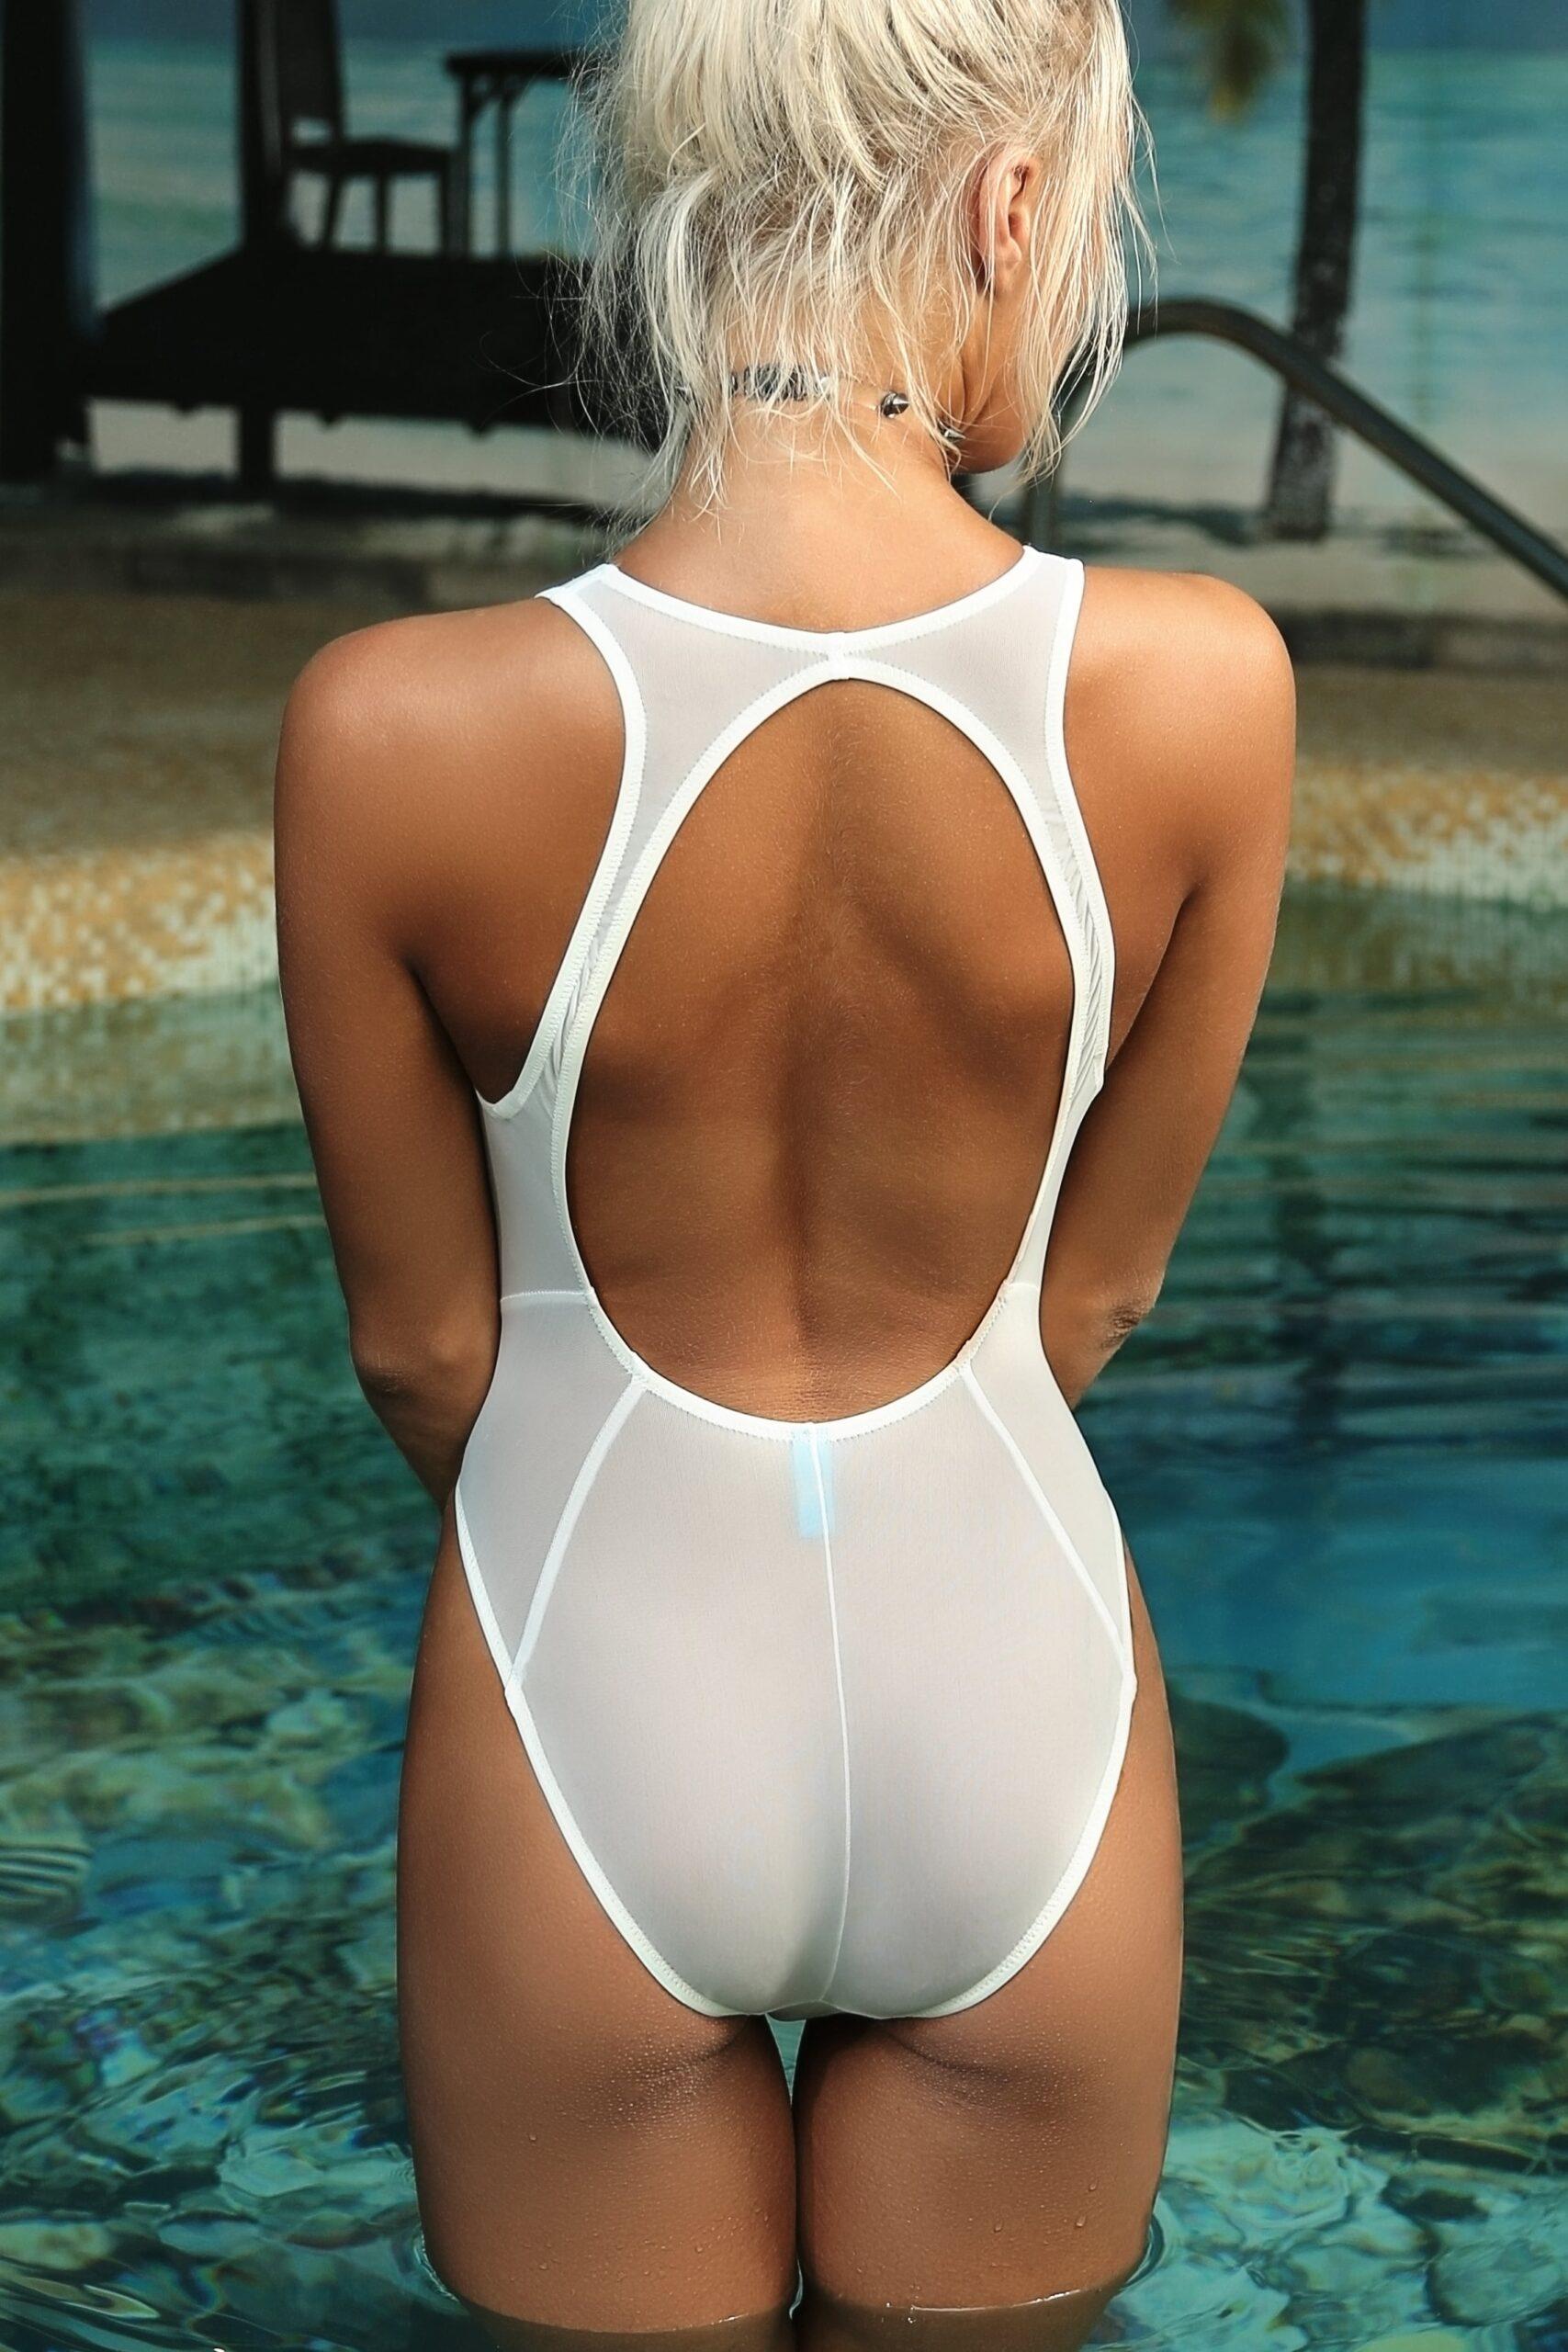 Sexy cute see through one piece swimsuit. Hot mesh high cut leg sheer when wet bodysuit monokini. Extreme high waist women white swimwear.